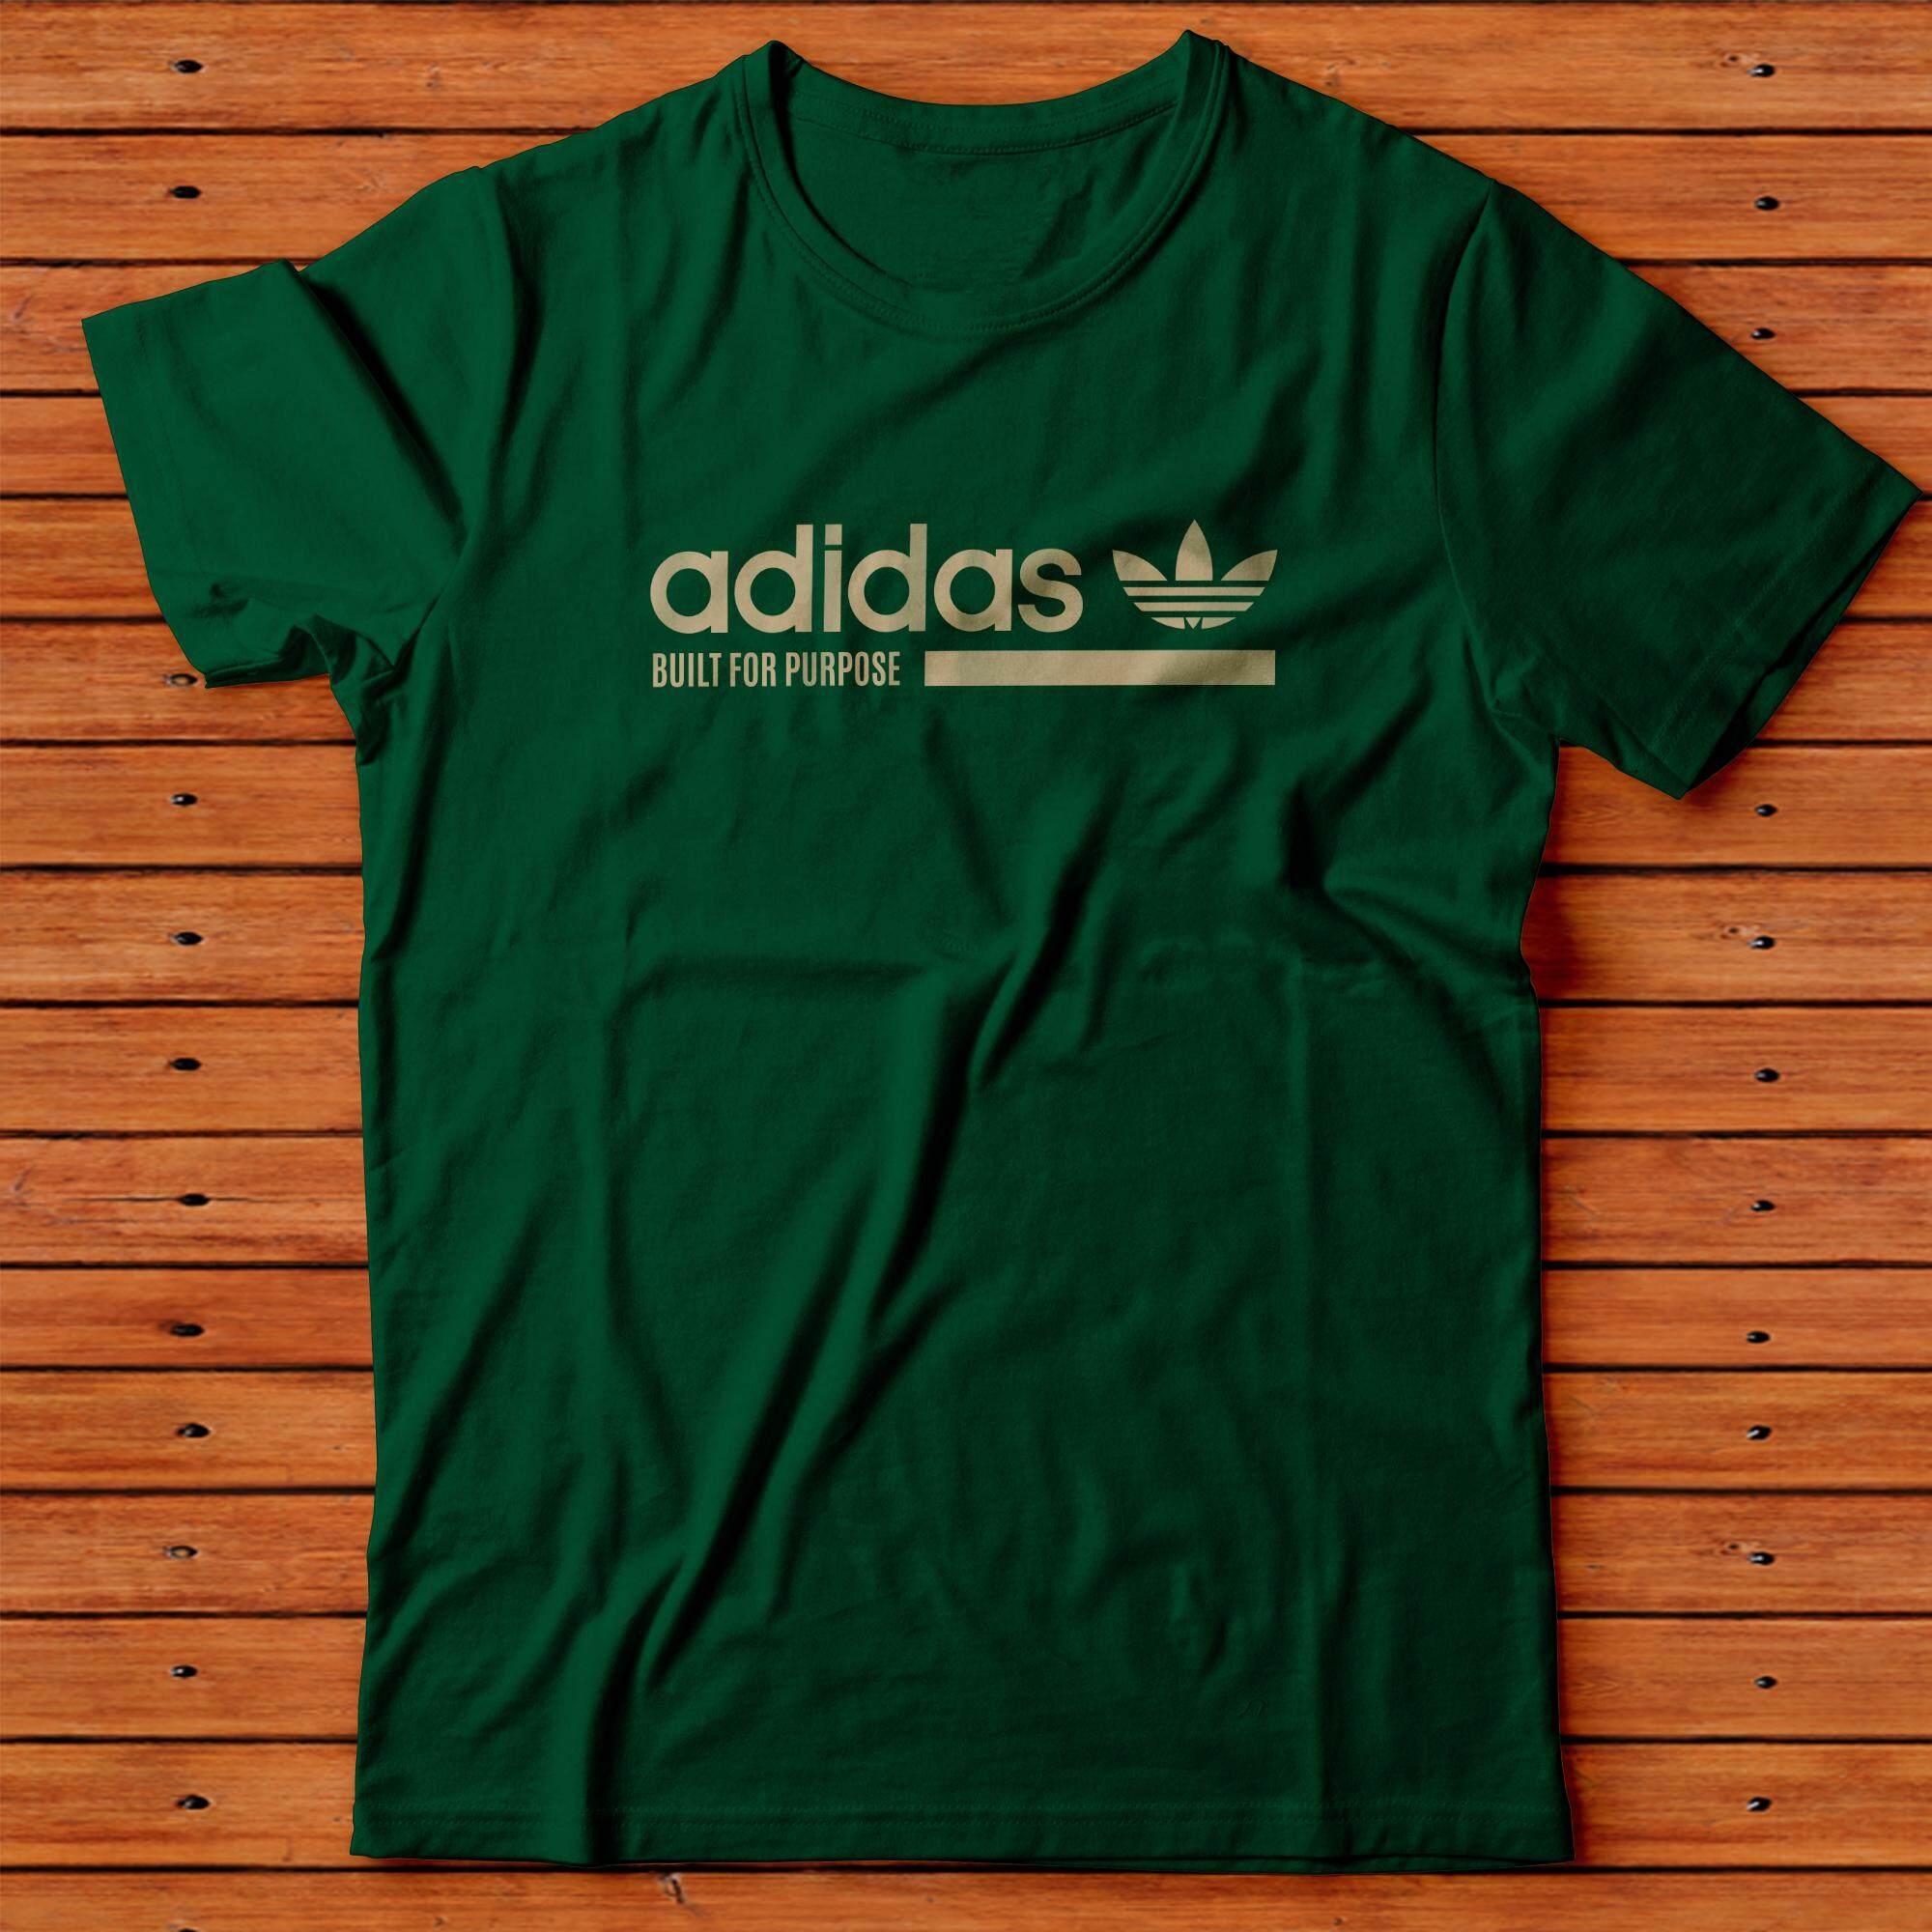 Adidas_ T shirt Cotton Unisex Vinyl Printed